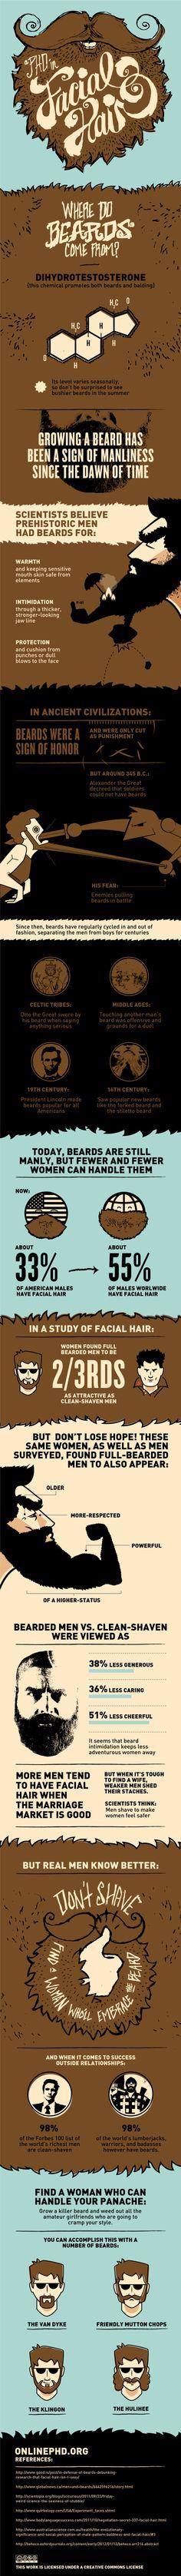 beards, style, stuff, funni, infograph, facials, facial hair, design, thing